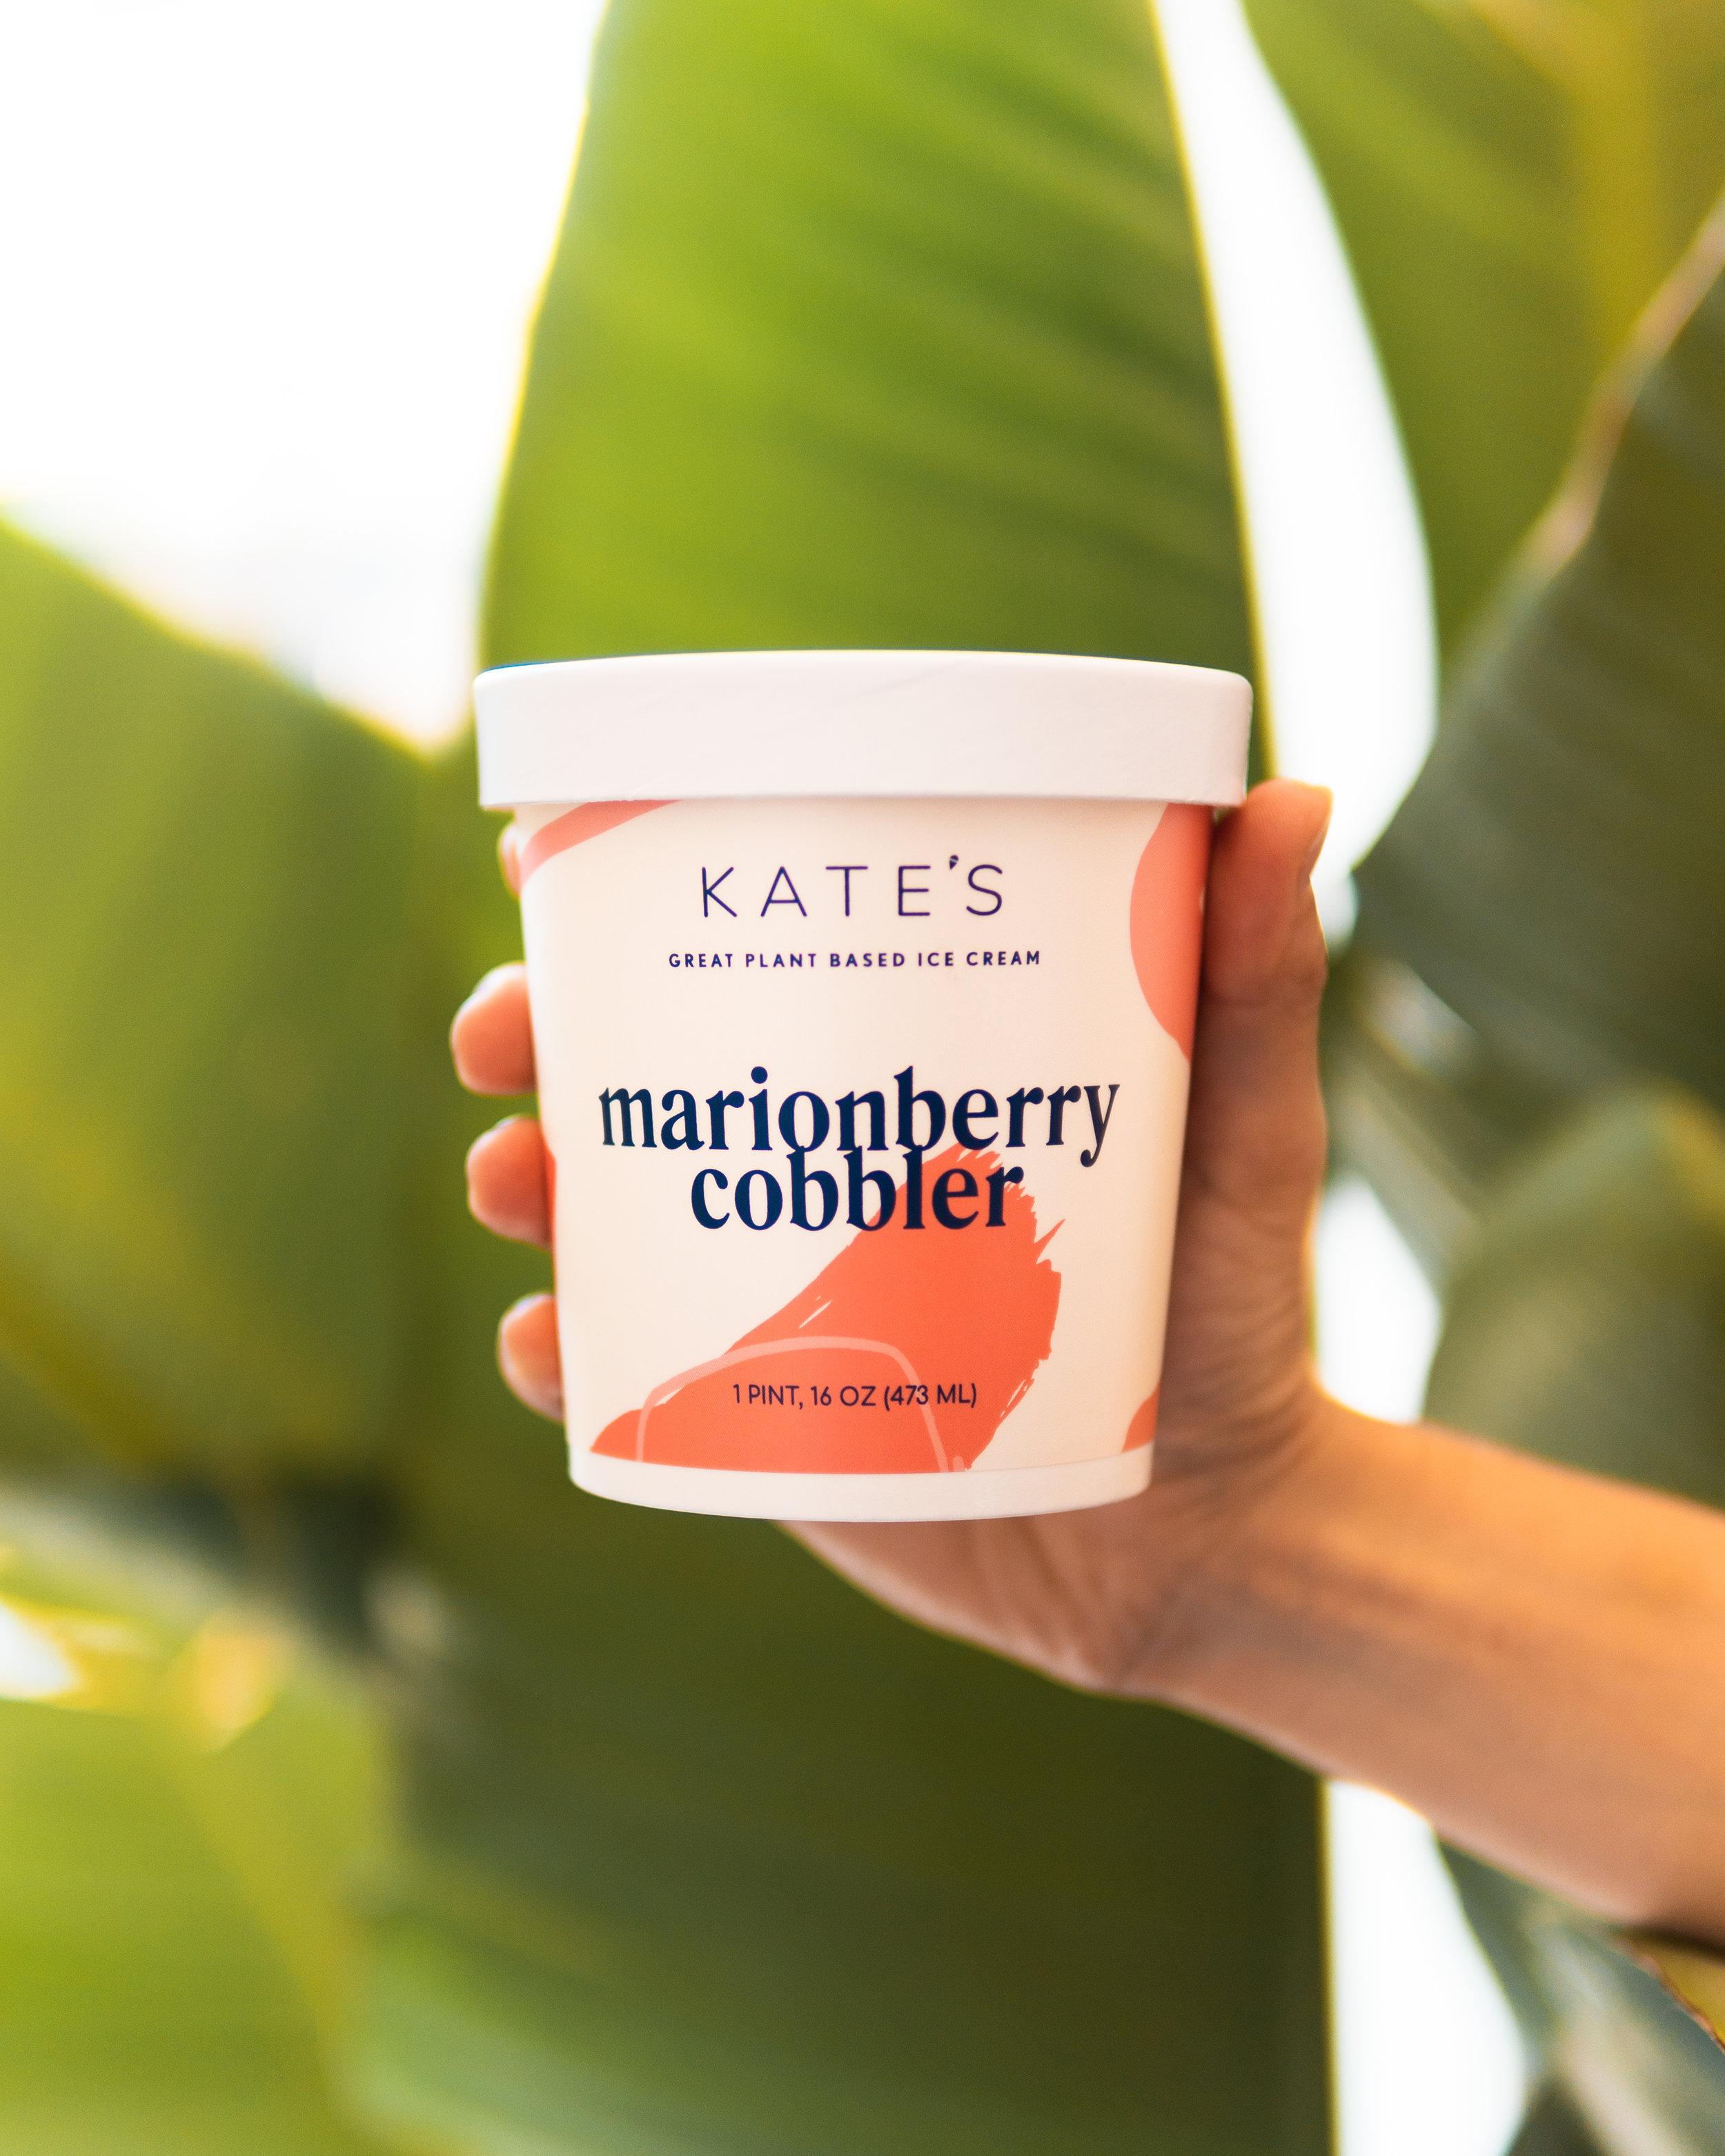 *coconut milk, *cane sugar, tapioca syrup, oregon marionberries, *vanilla extract, walnuts, almond flour, gluten free oats, Faba butter, vanilla beans, *coconut oil, lemon juice, molasses, *cinnamon, black pepper, sea salt, sunflower lecithin, nutritional yeast, arrowroot.  contains: walnuts, almonds, coconut  *organic ingredient